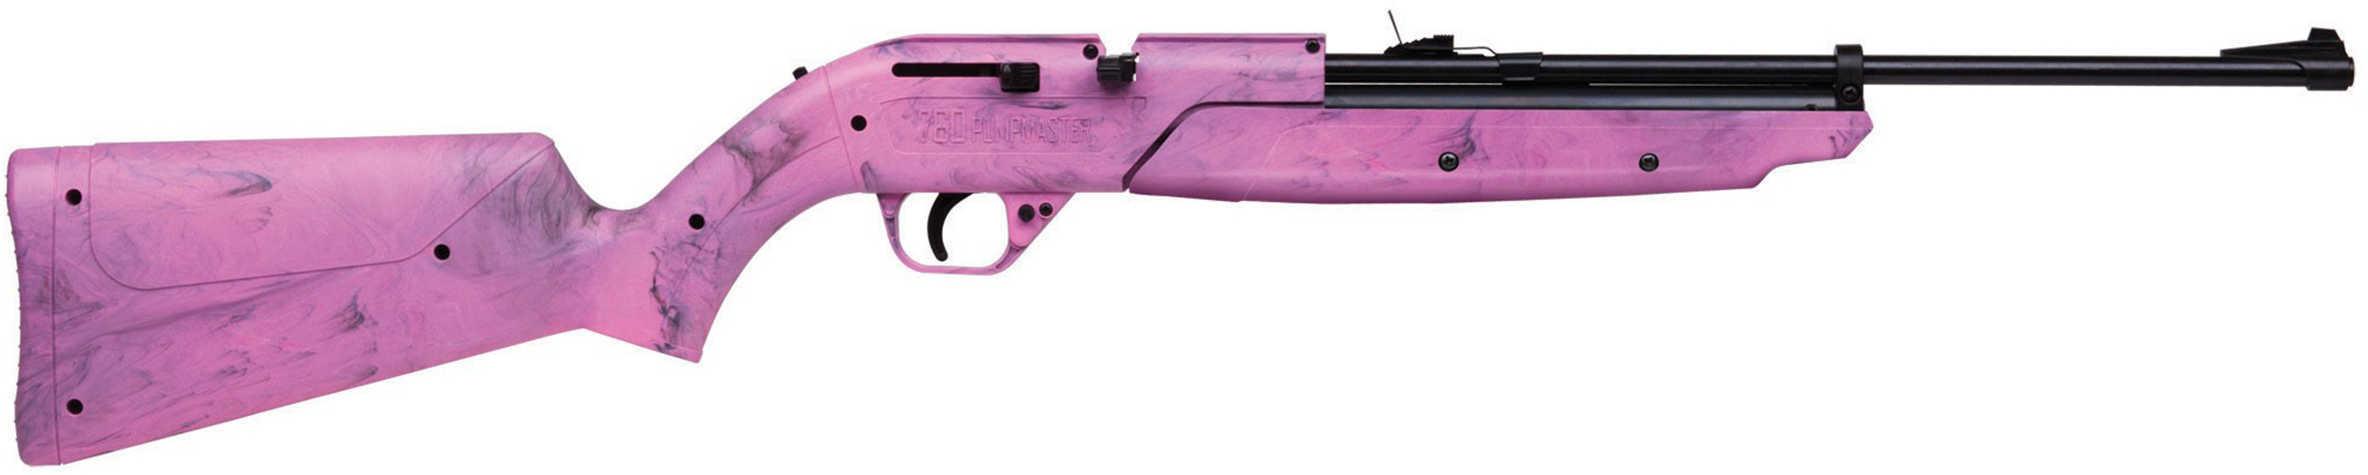 Crosman Pumpmaster 760 Pink .177 BB Model 760P